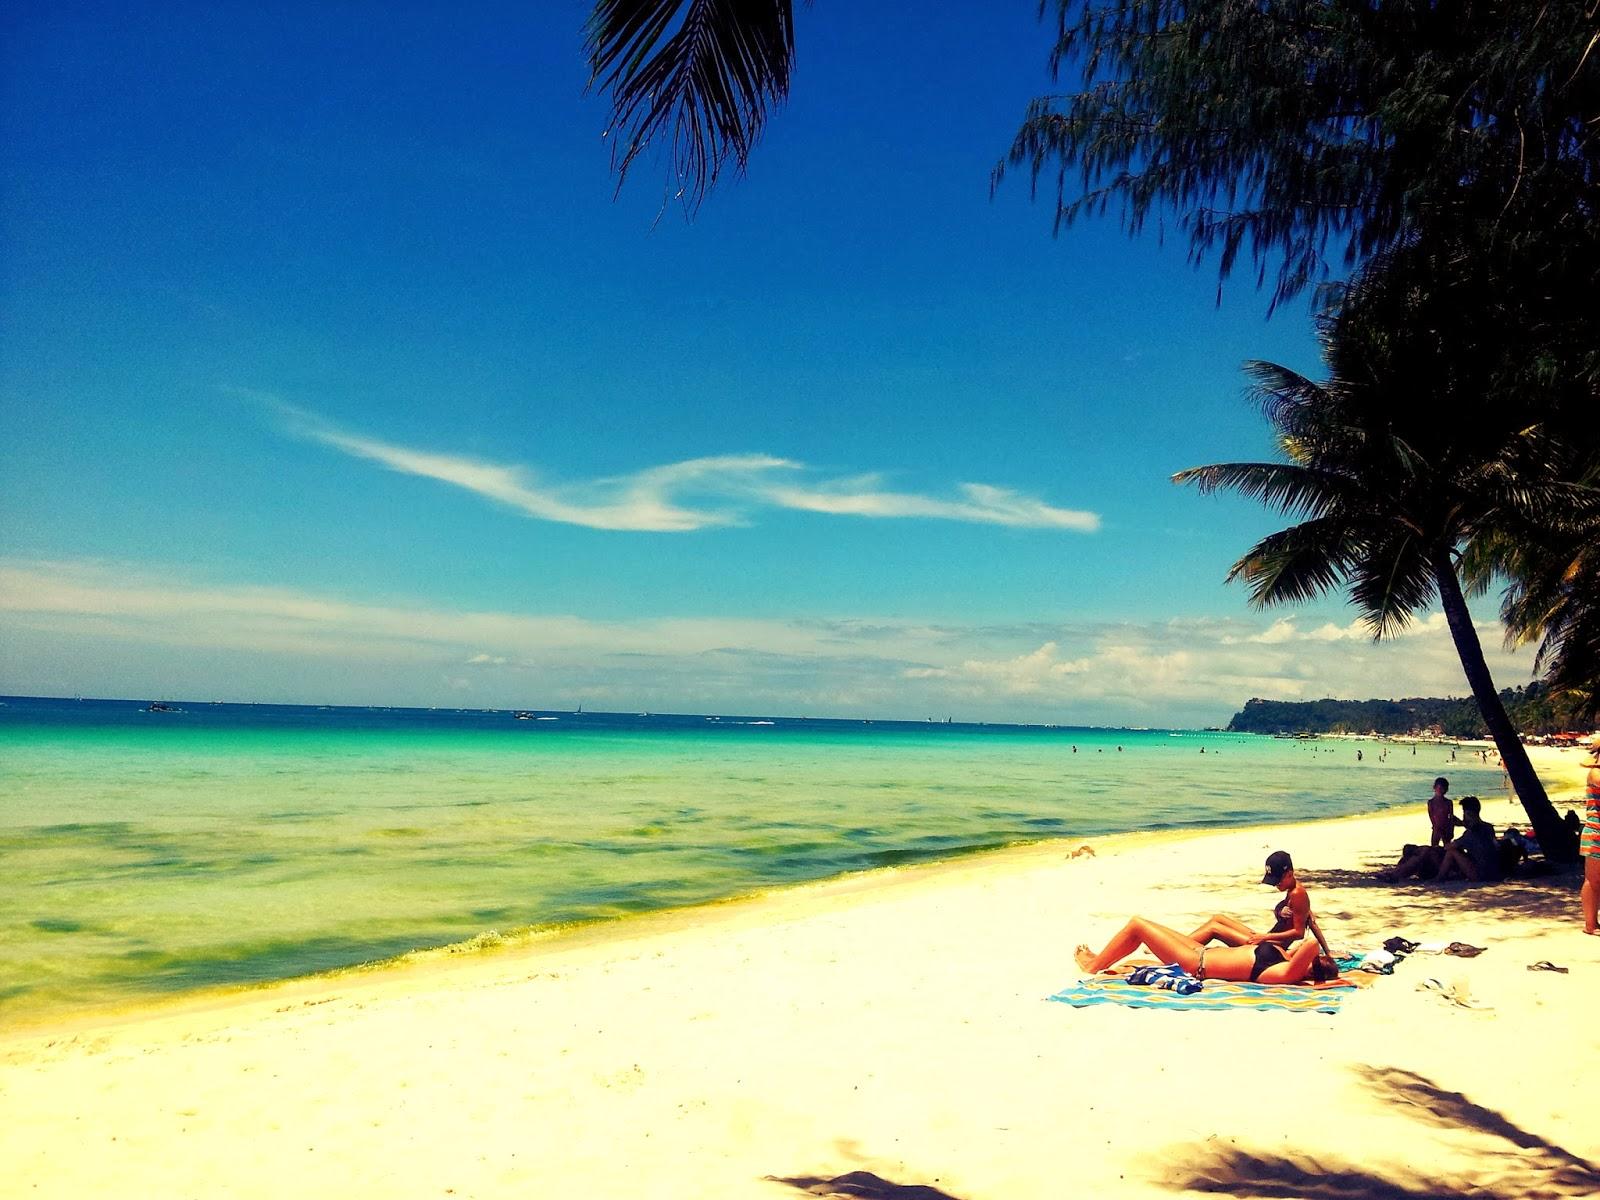 Flashback Friday: Holy week in Boracay (March 2013)